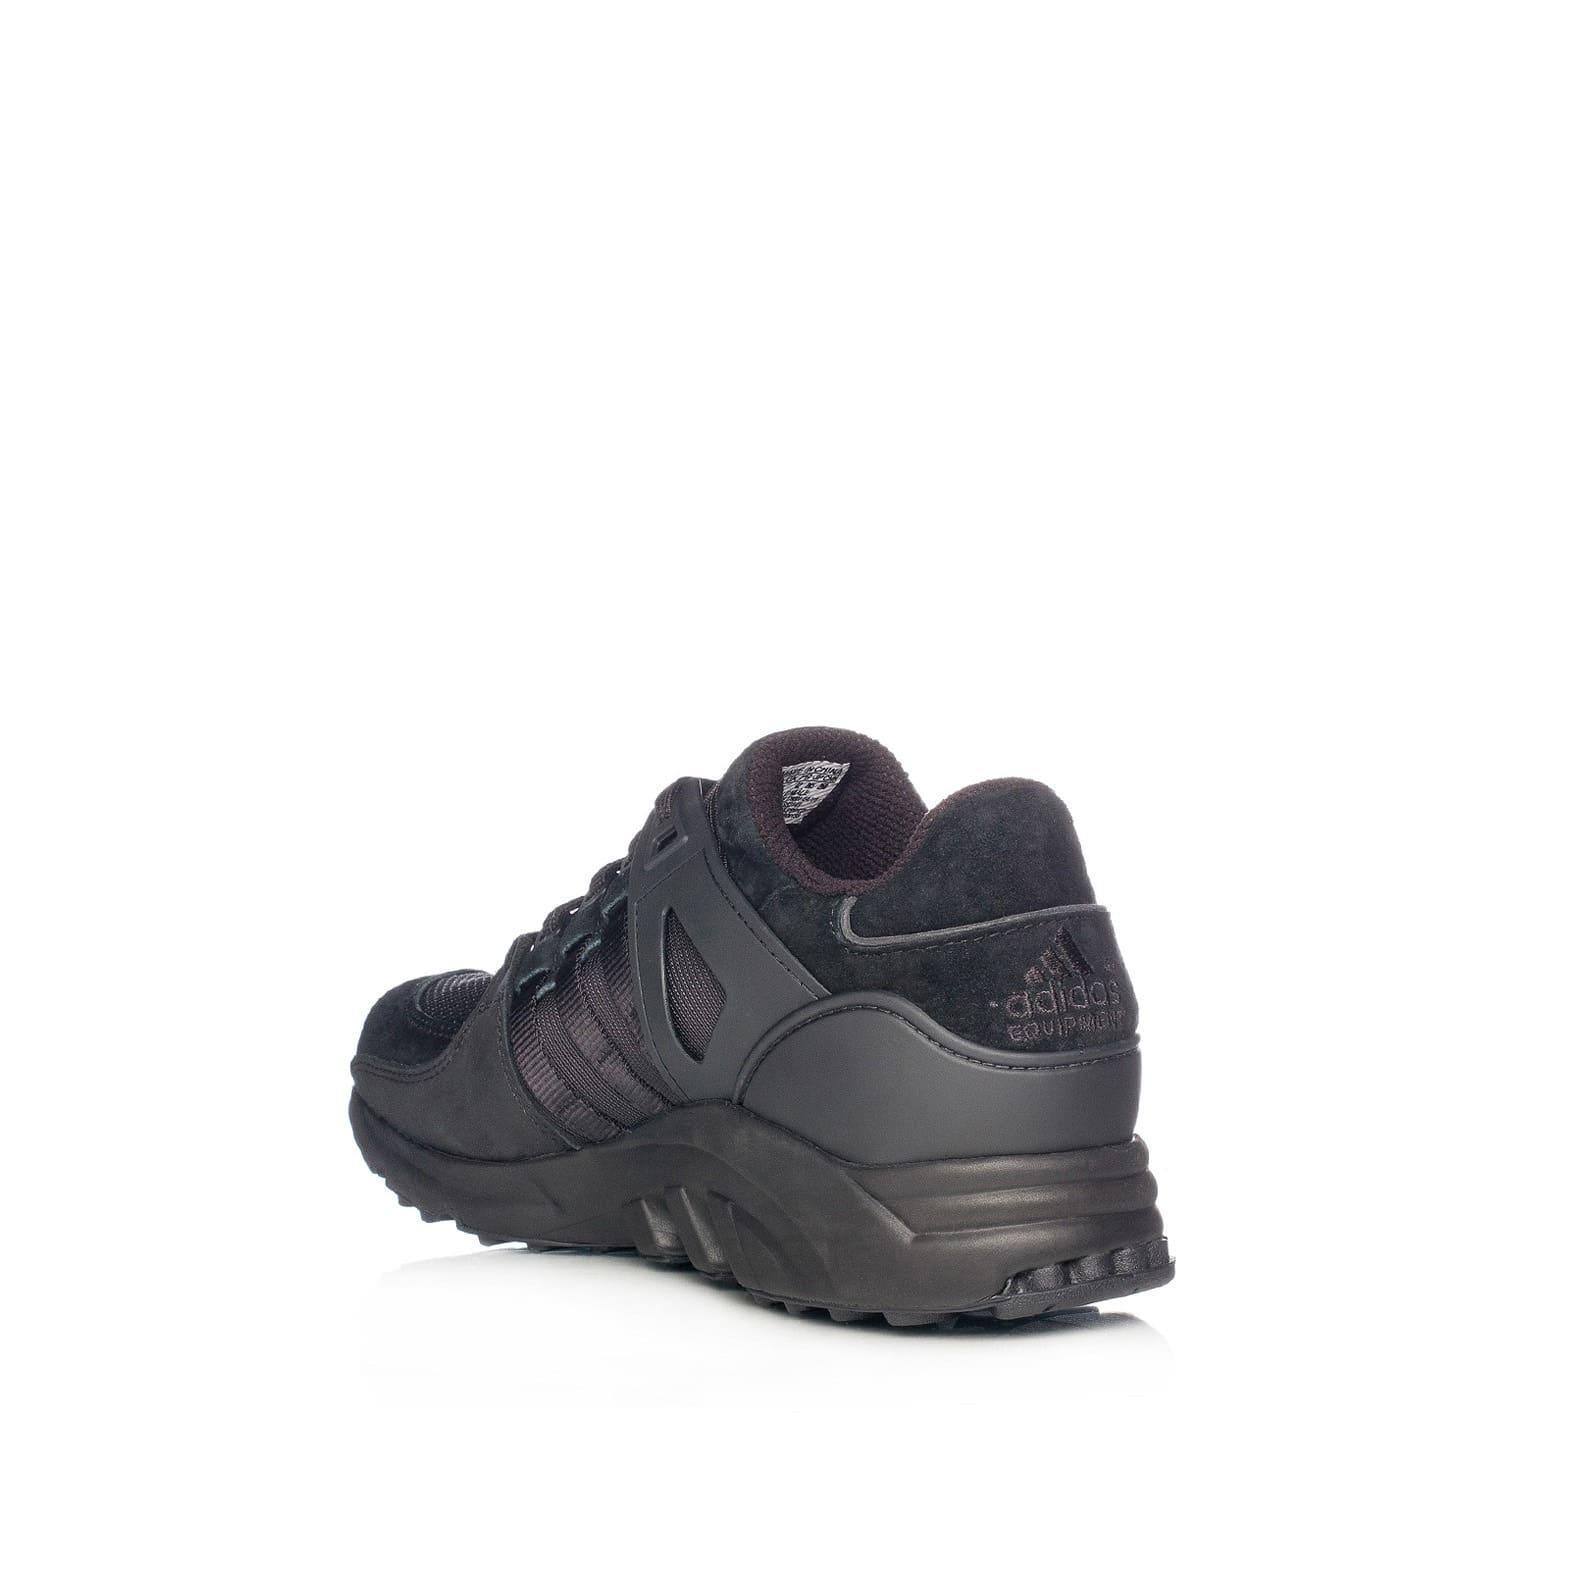 adidas-equipment-running-support-s32149